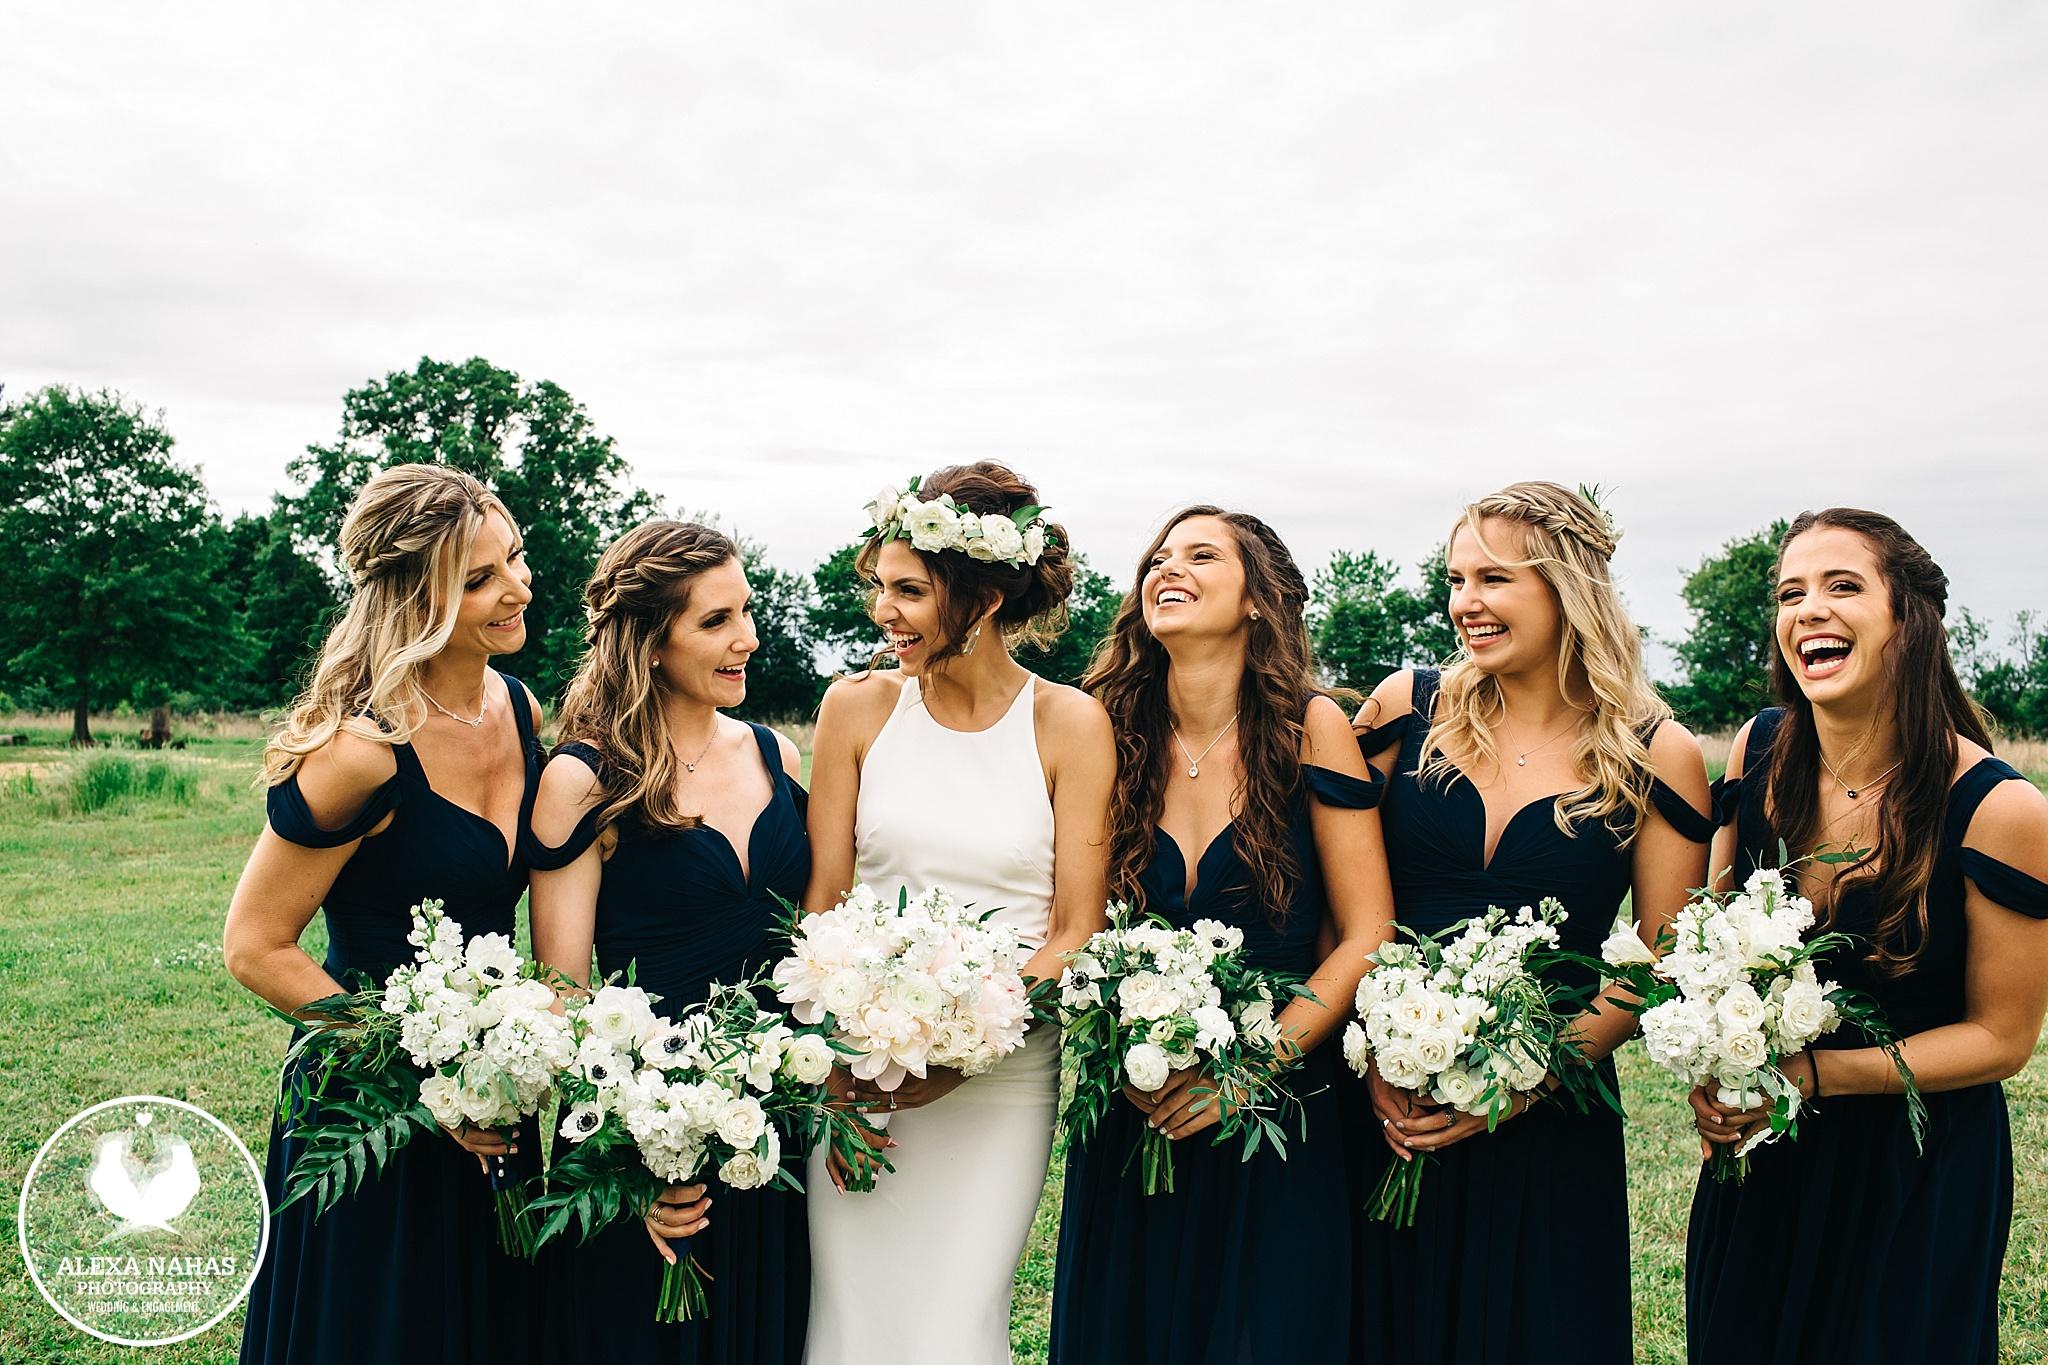 Renee and Bridesmaids DIY bouquets